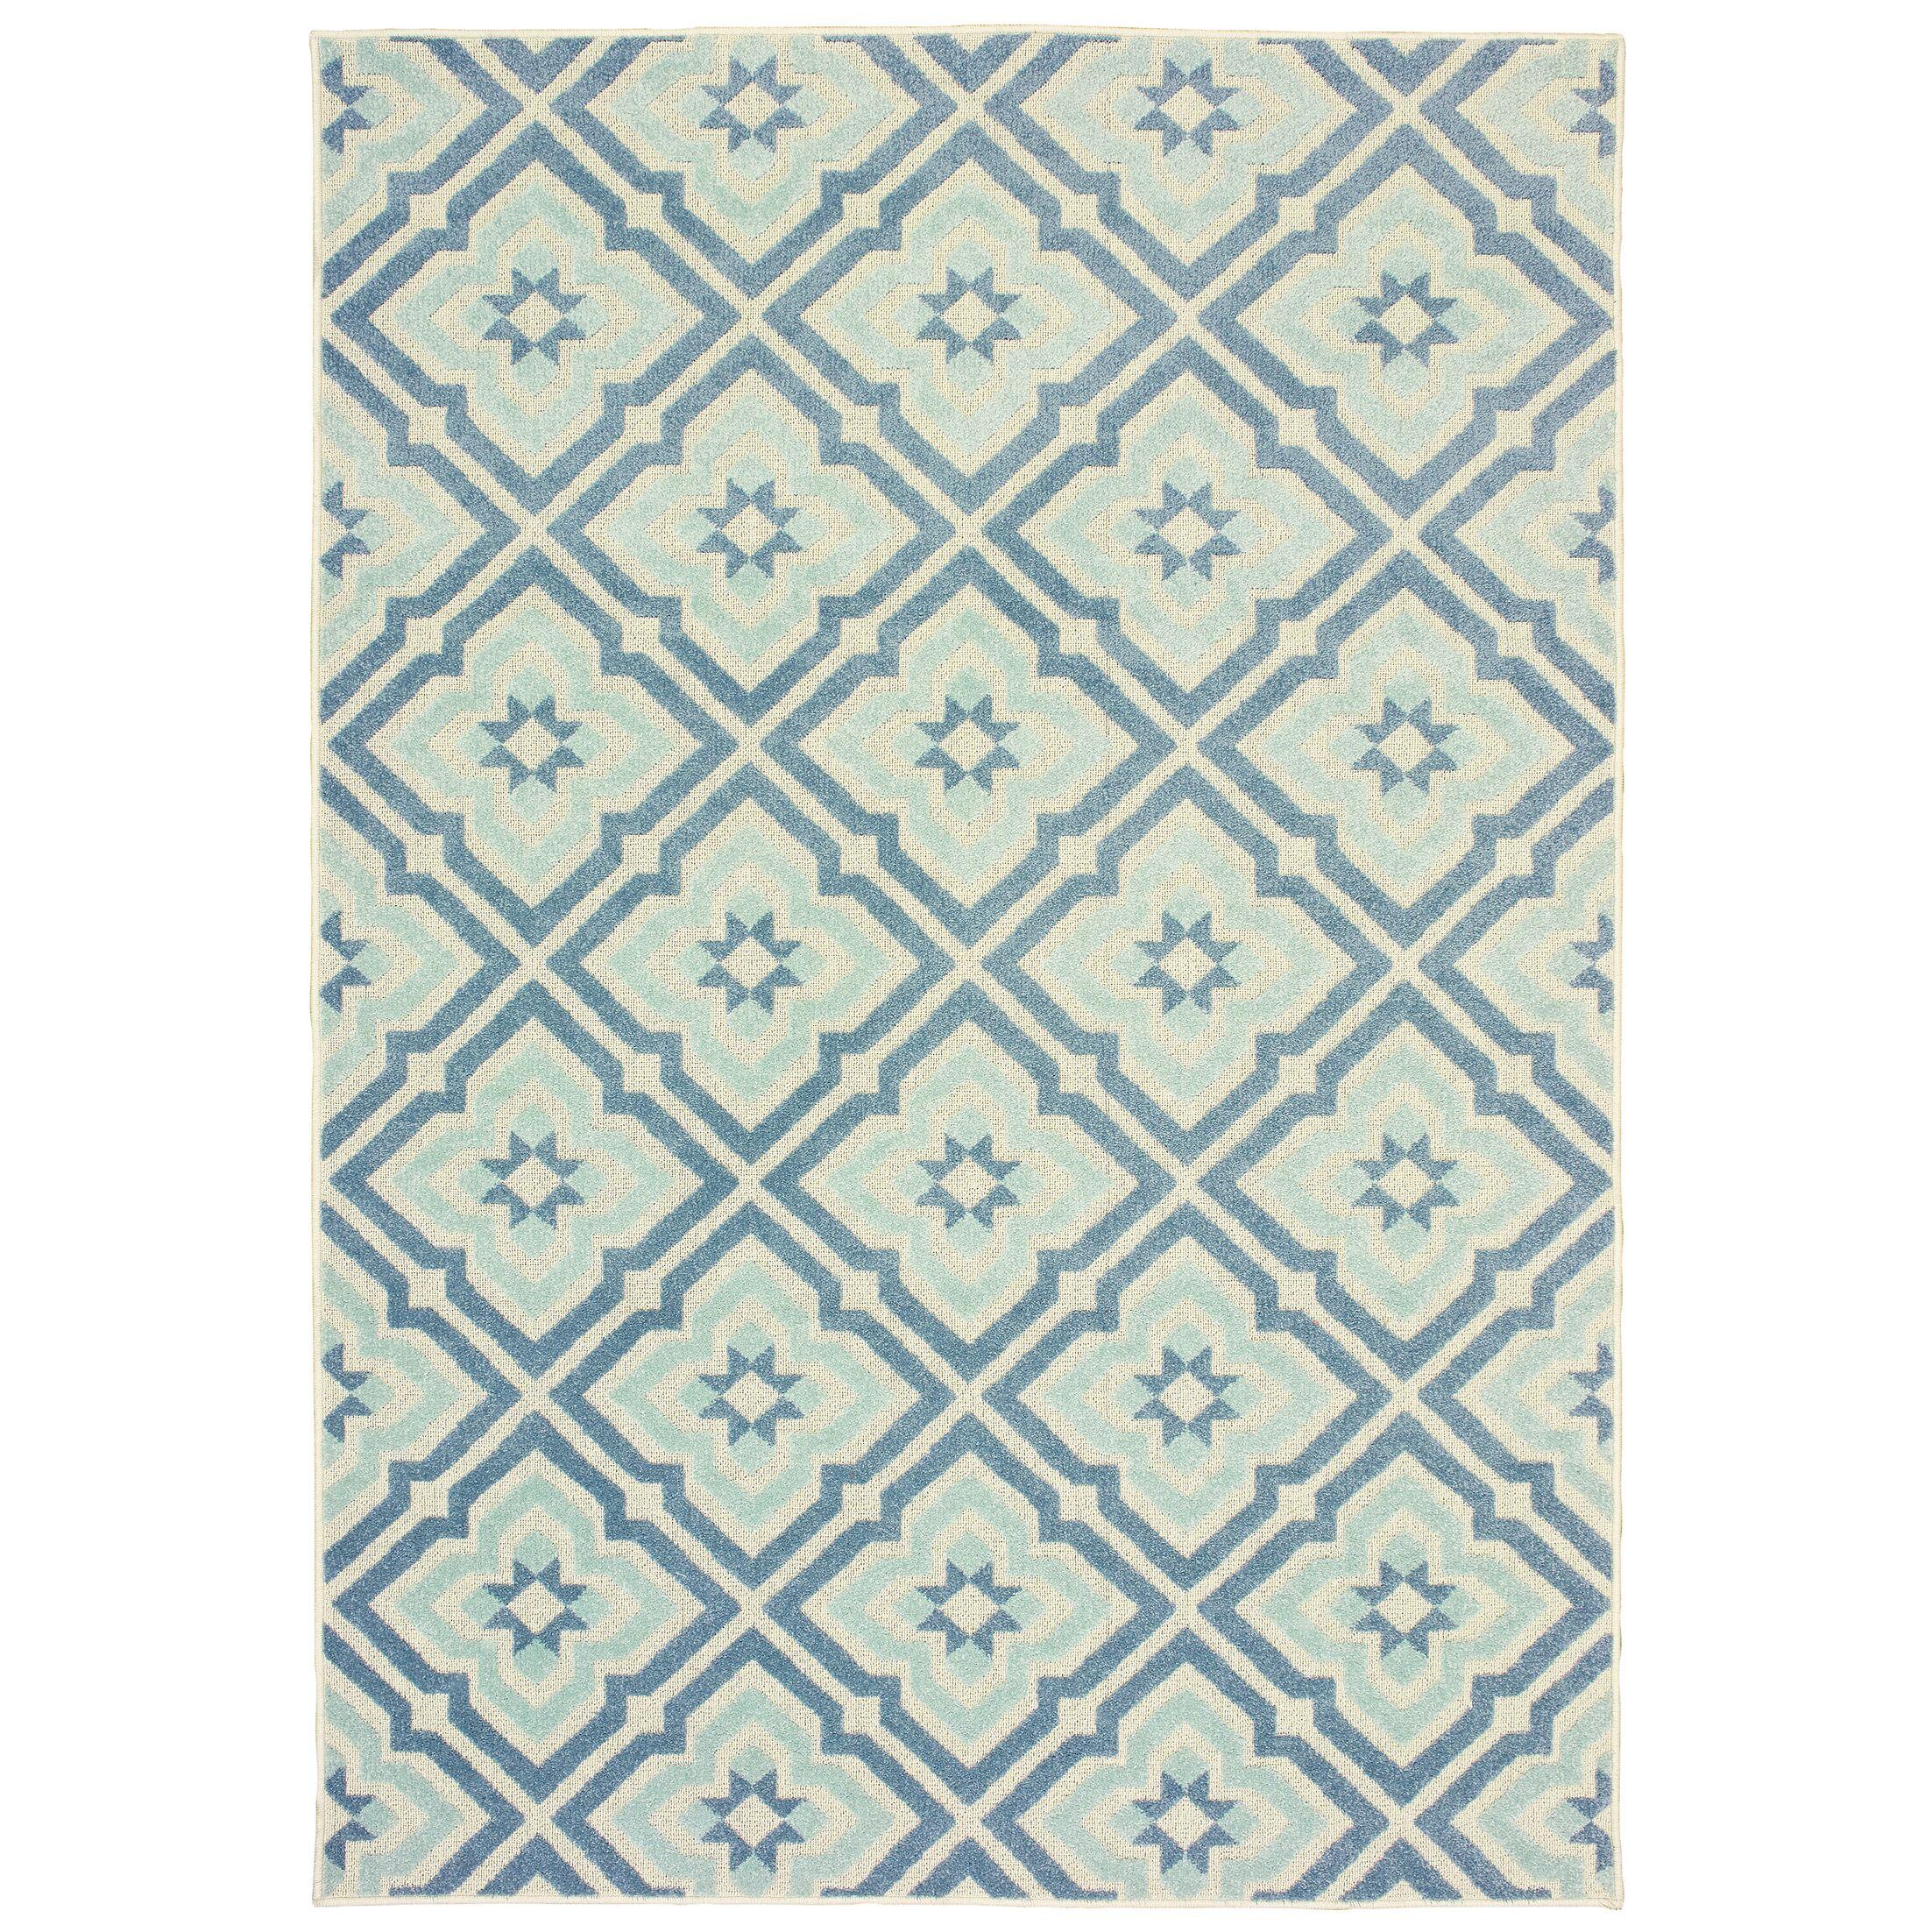 Fluellen Blue/Ivory Indoor/Outdoor Area Rug Rug Size: Rectangle 6'7